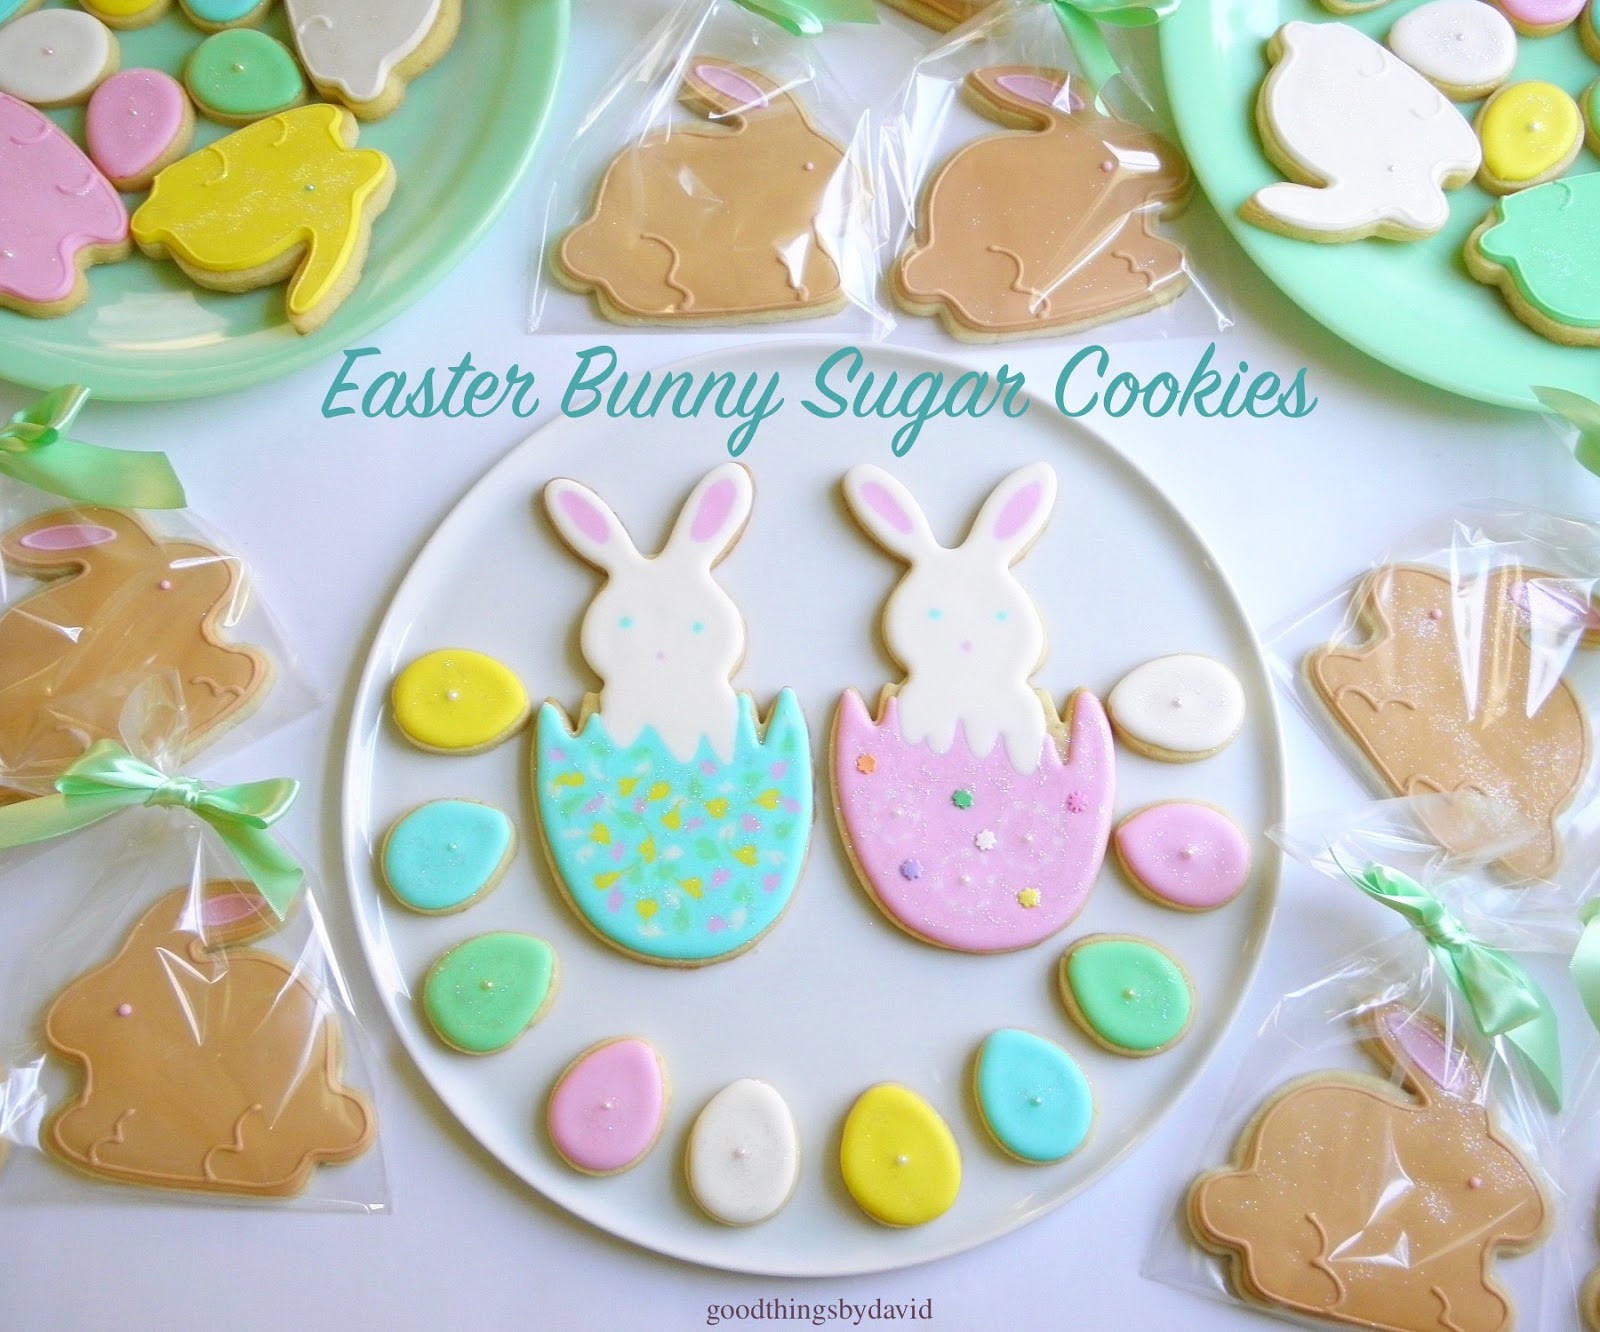 Easter Bunny Sugar Cookies  Good Things by David Easter Bunny Sugar Cookies